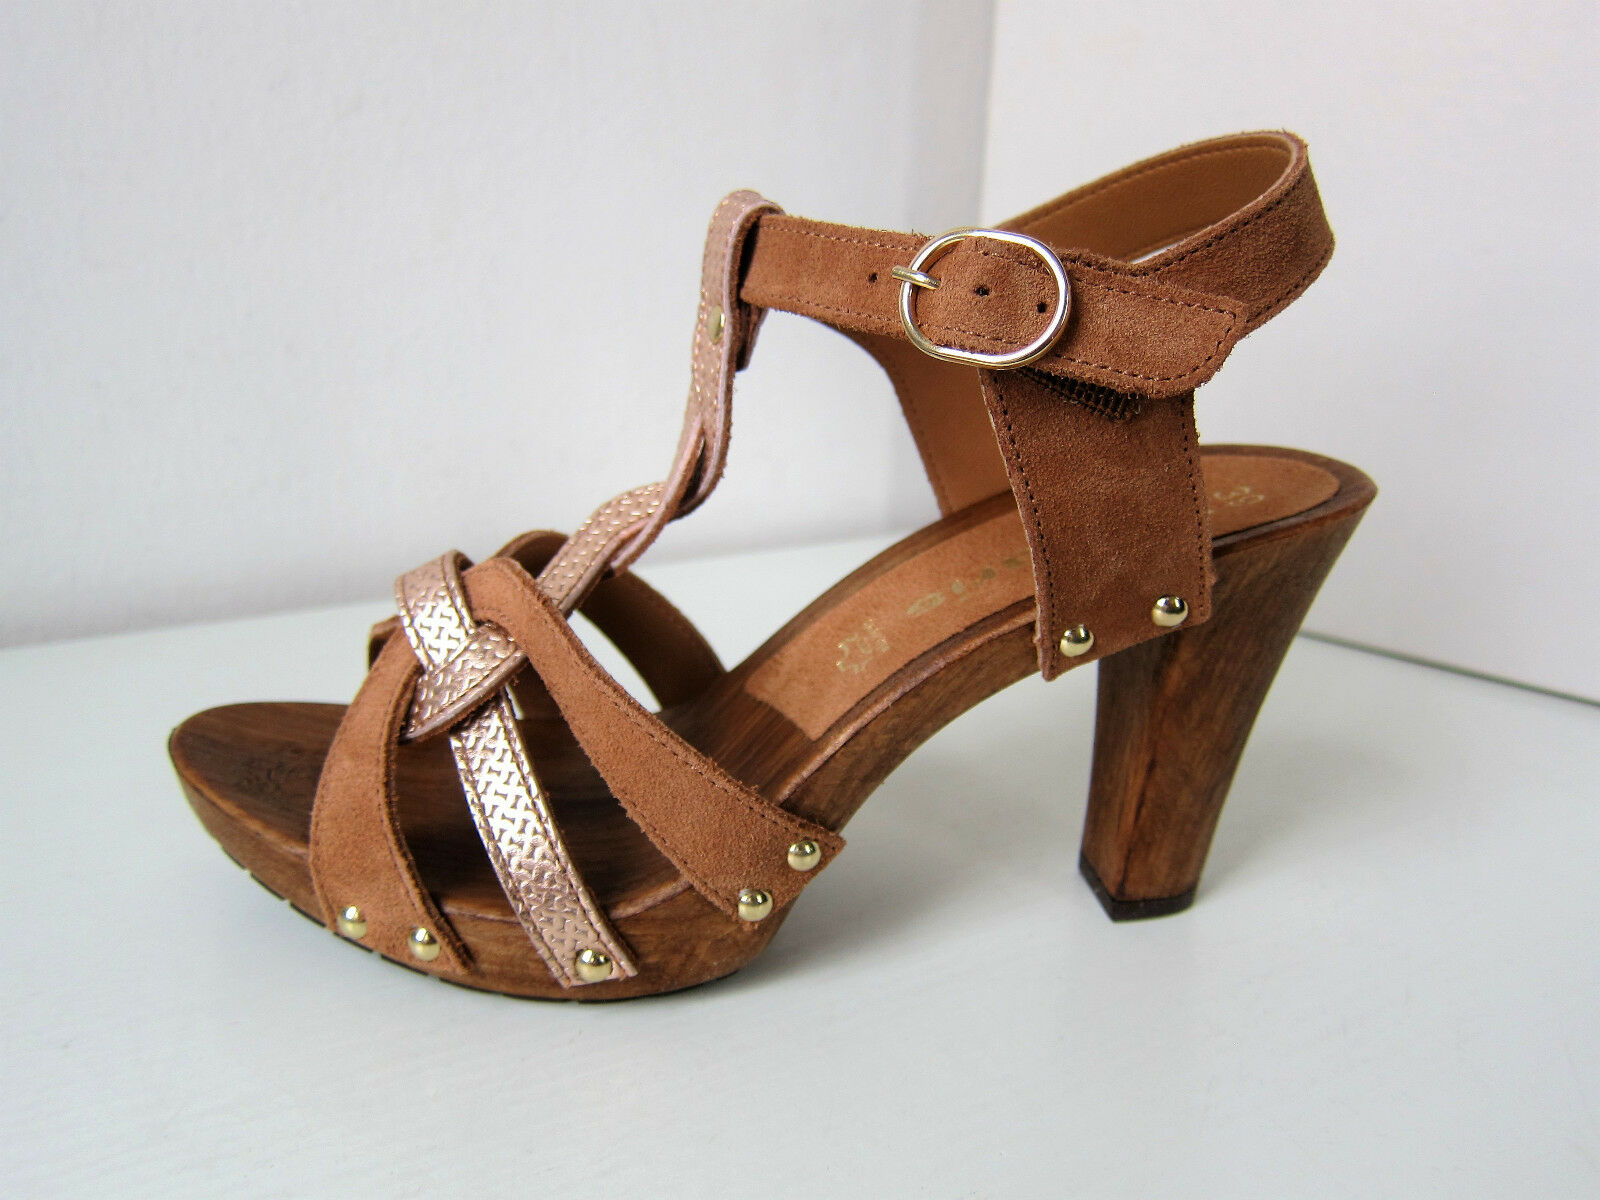 Tamaris Sandale Sandalette braun Gr. 36 cuoio Rosa Gold RosaGold Glitzer Plateau